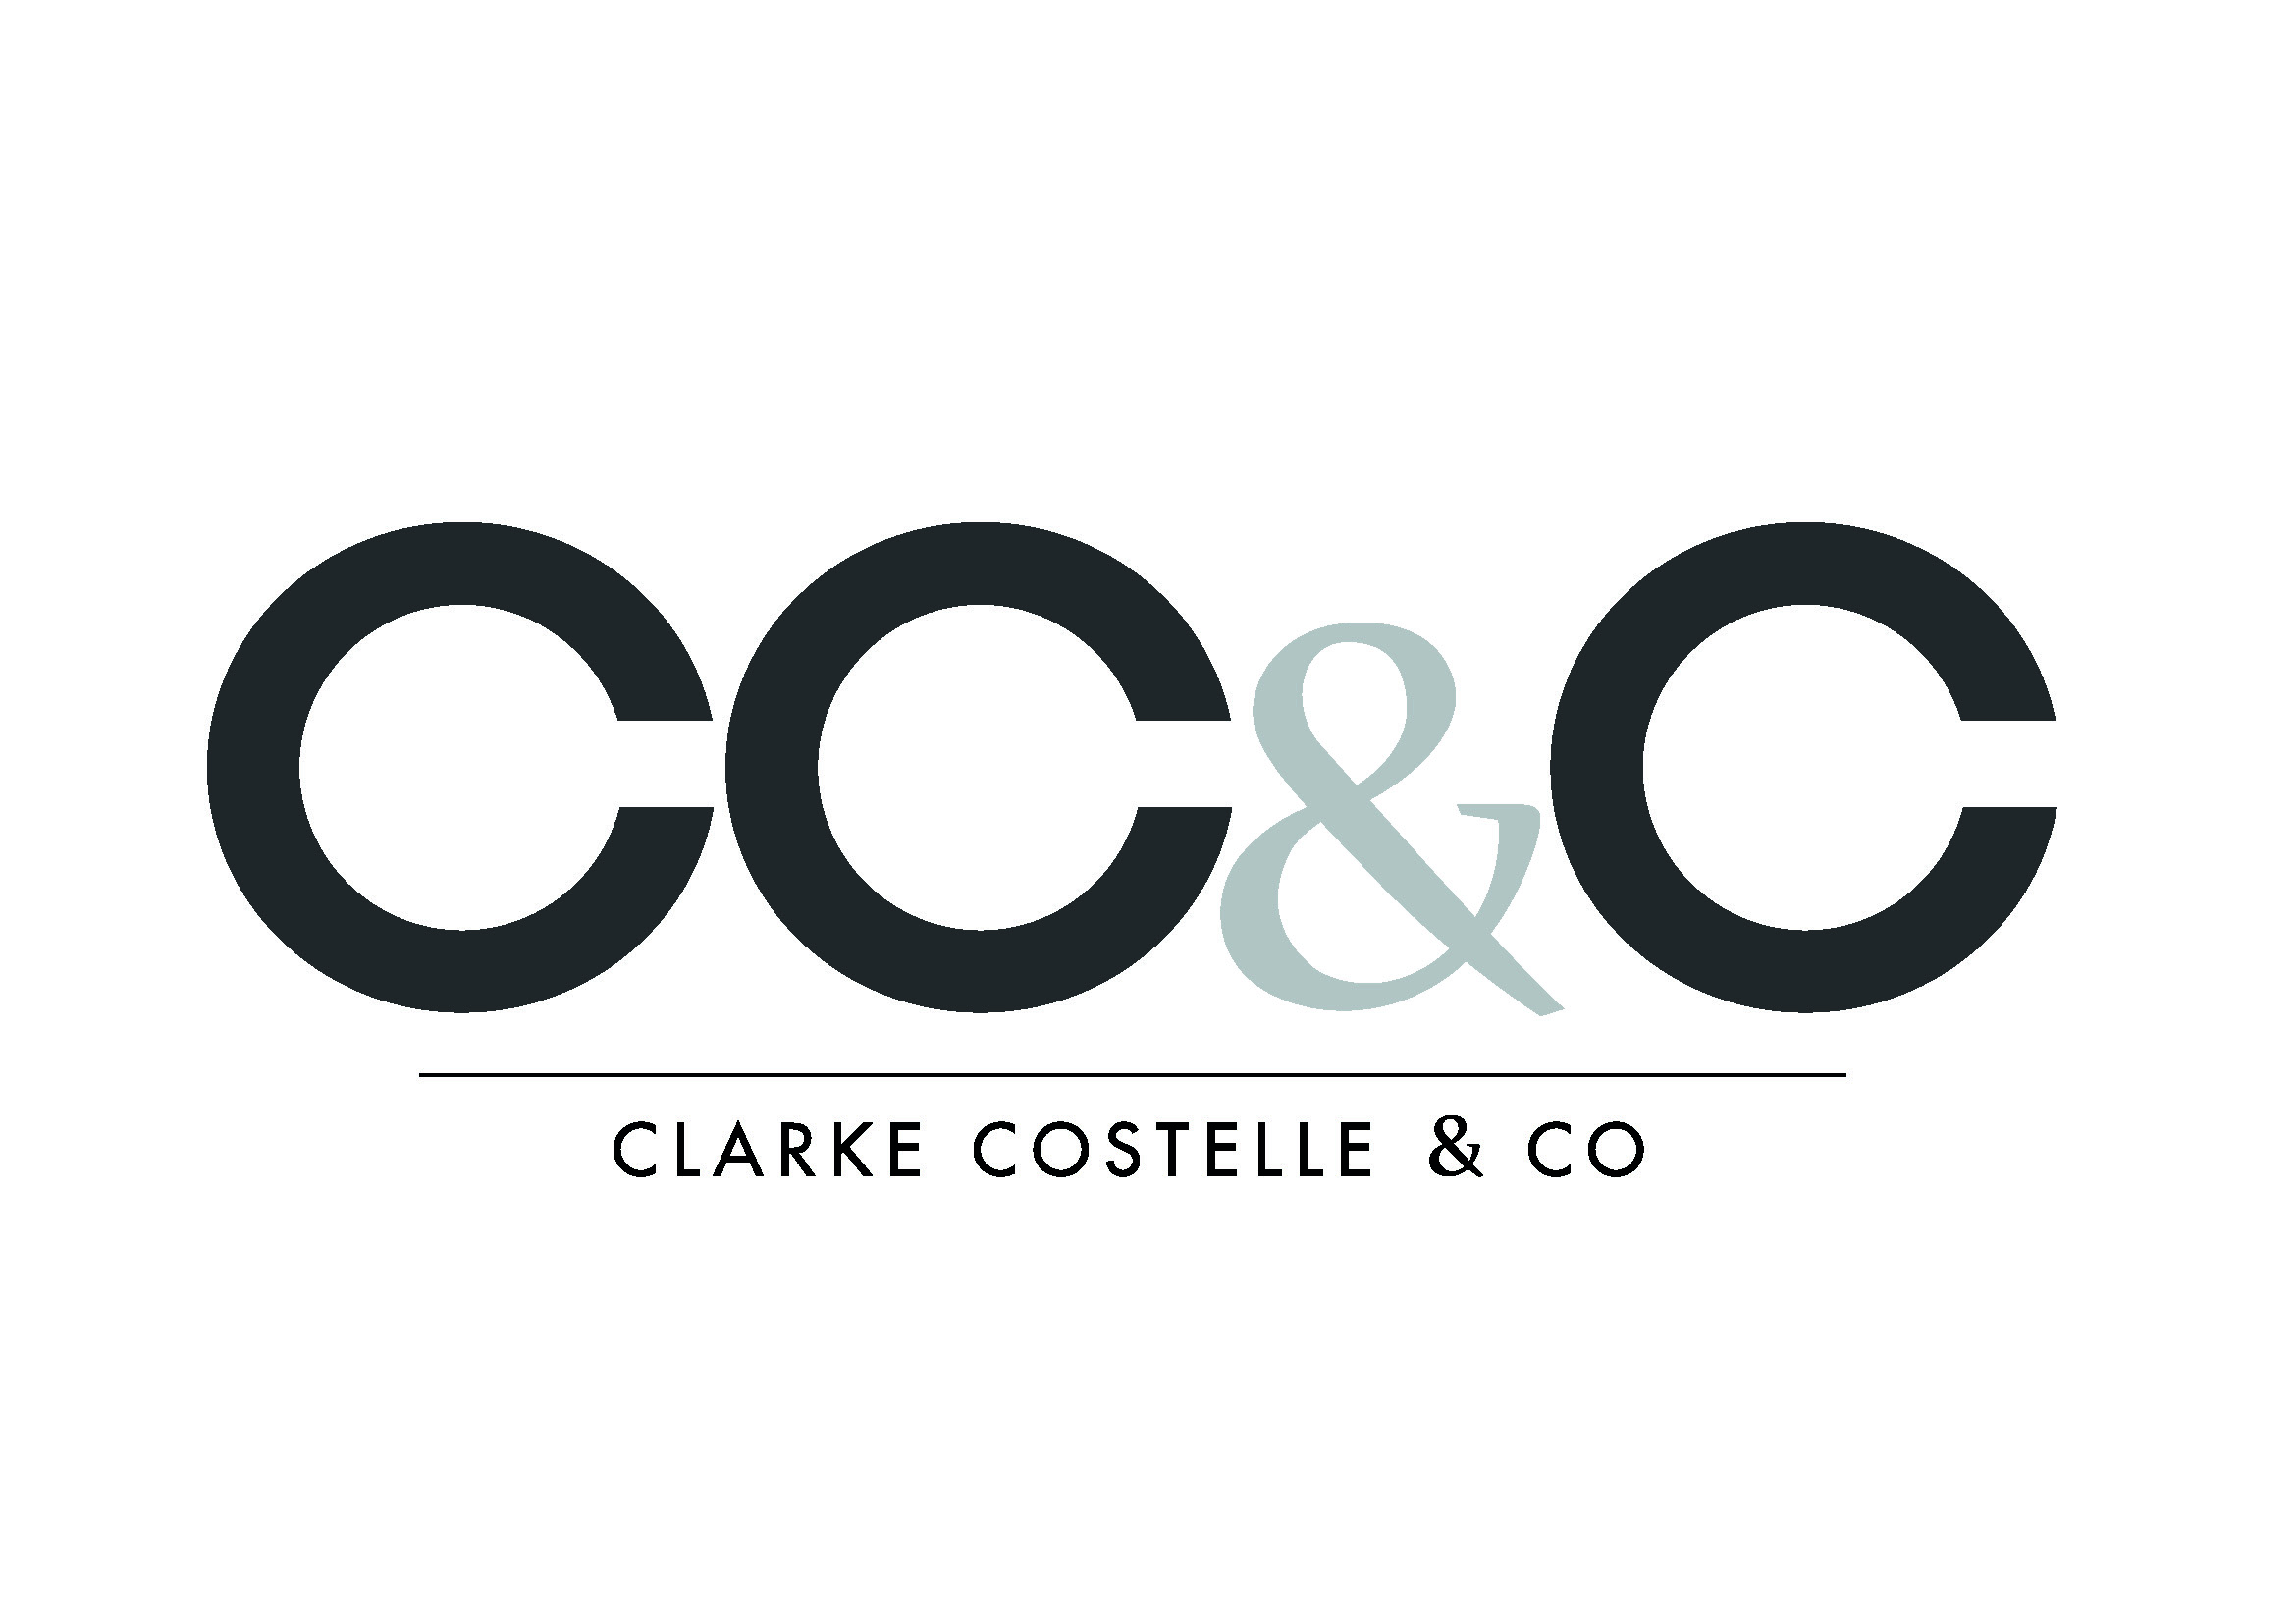 CC&C u2013 Clarke Costelle et Cie logo.jpeg